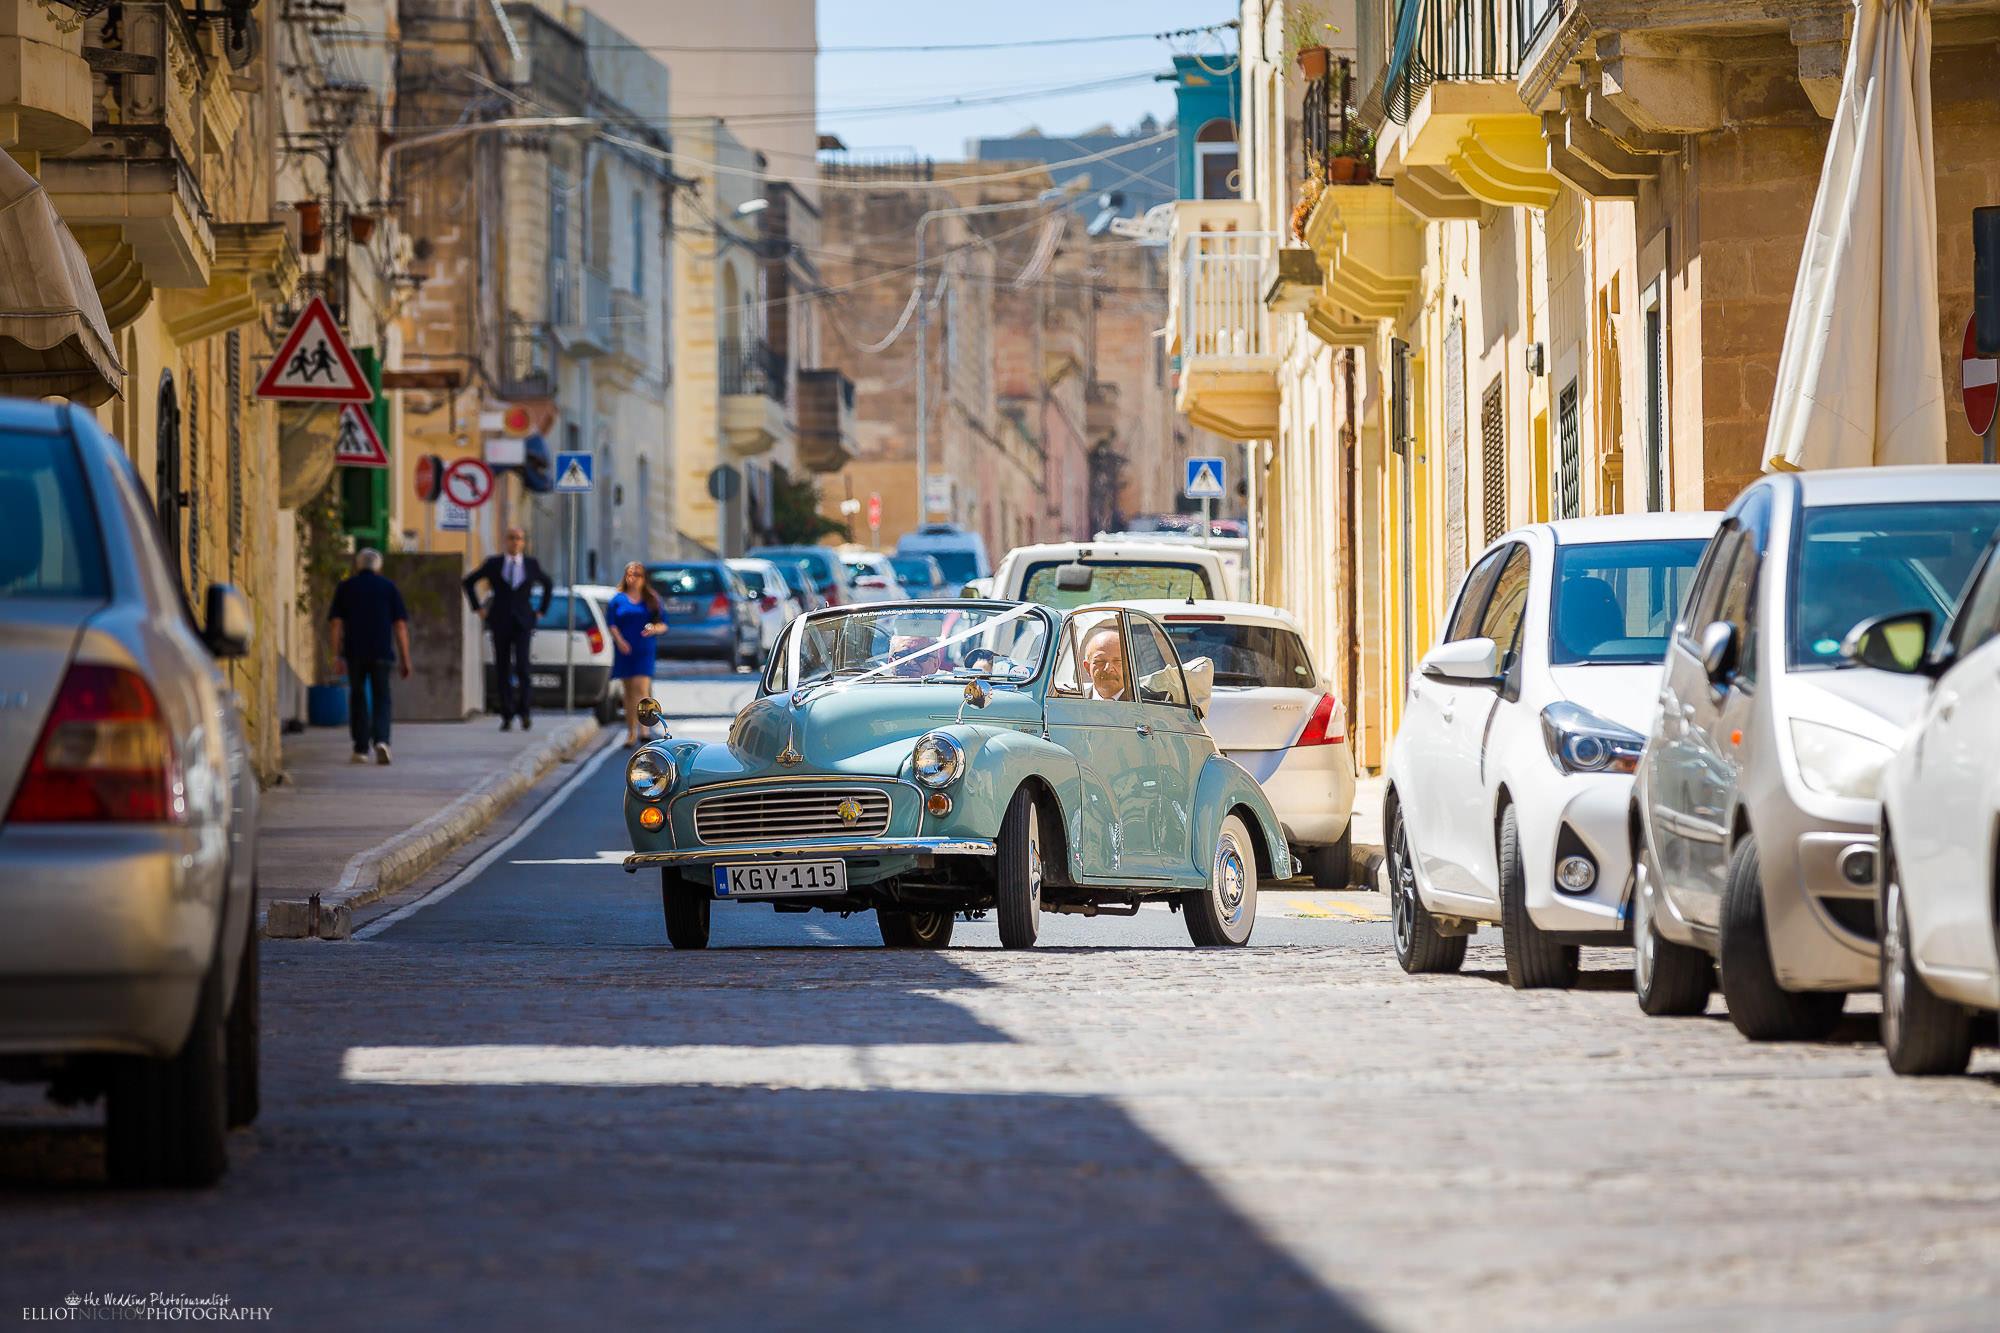 Morris-Minor-wedding-car-destination-weddings-Malta